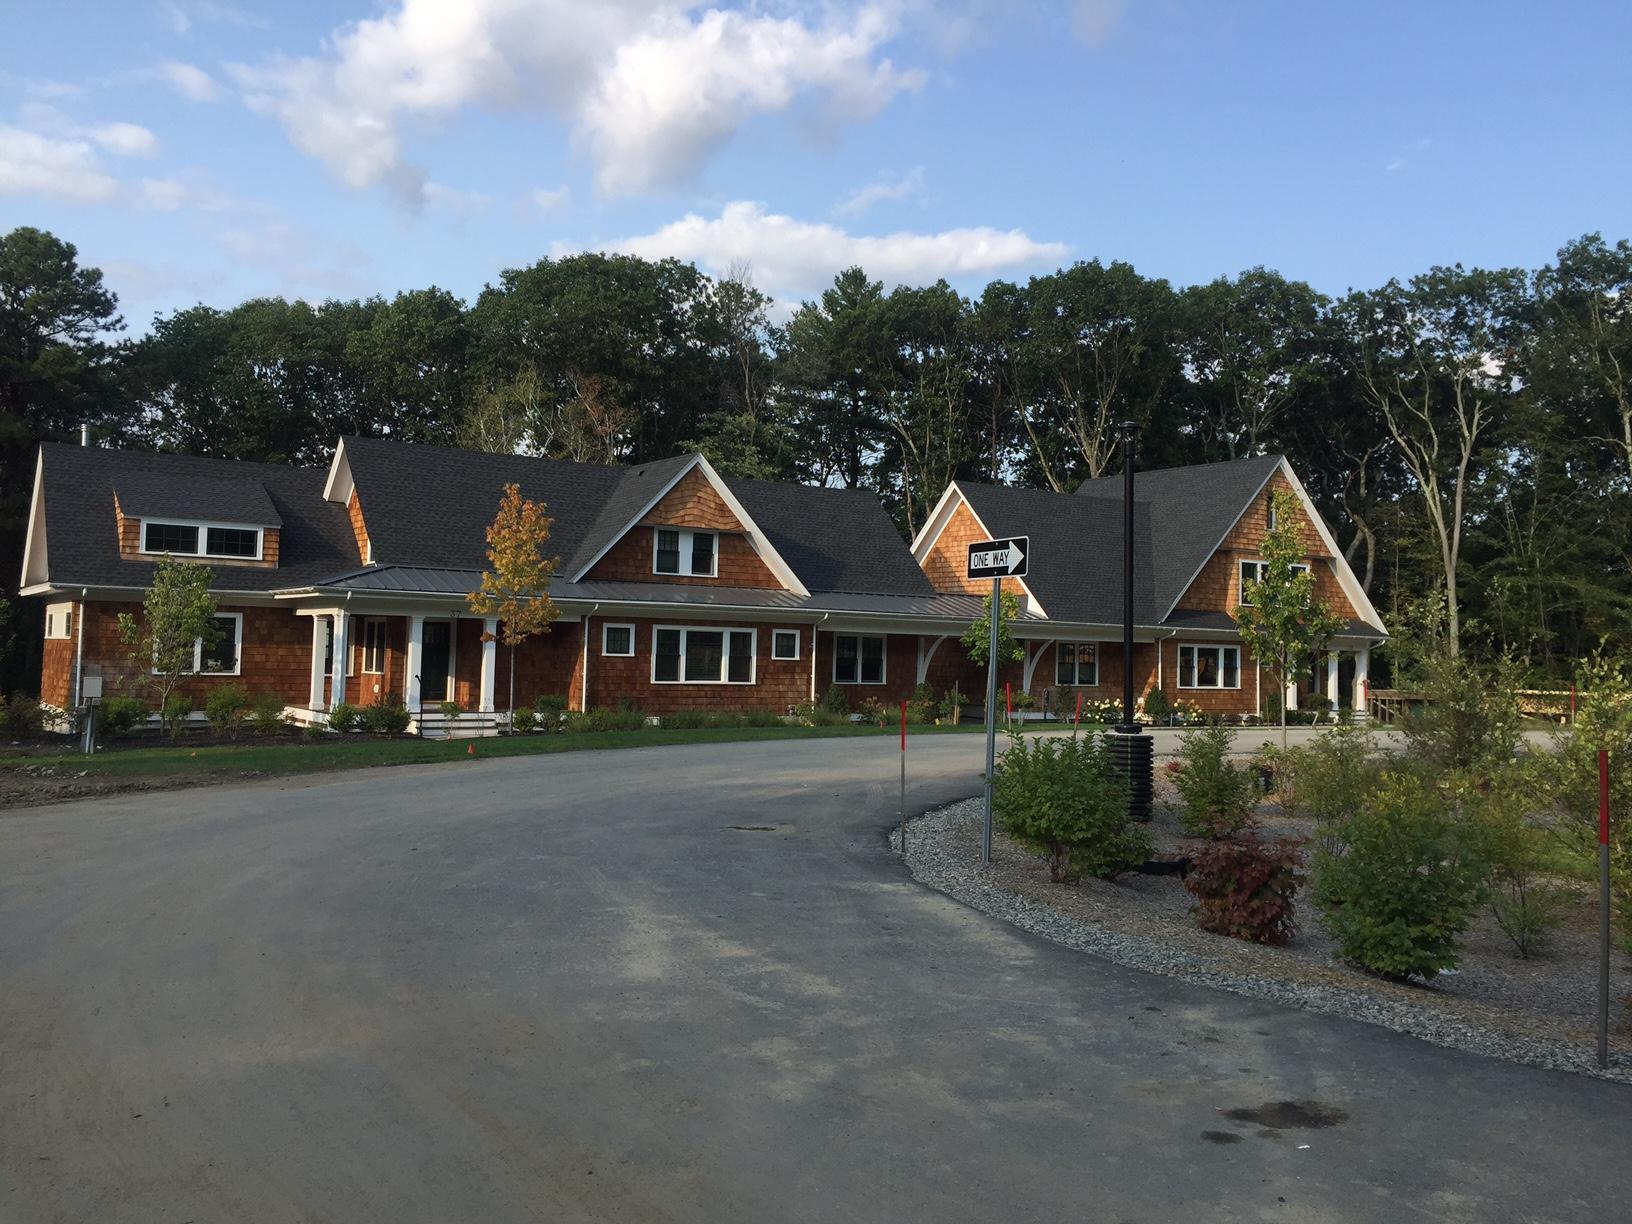 village homes - planned residential development